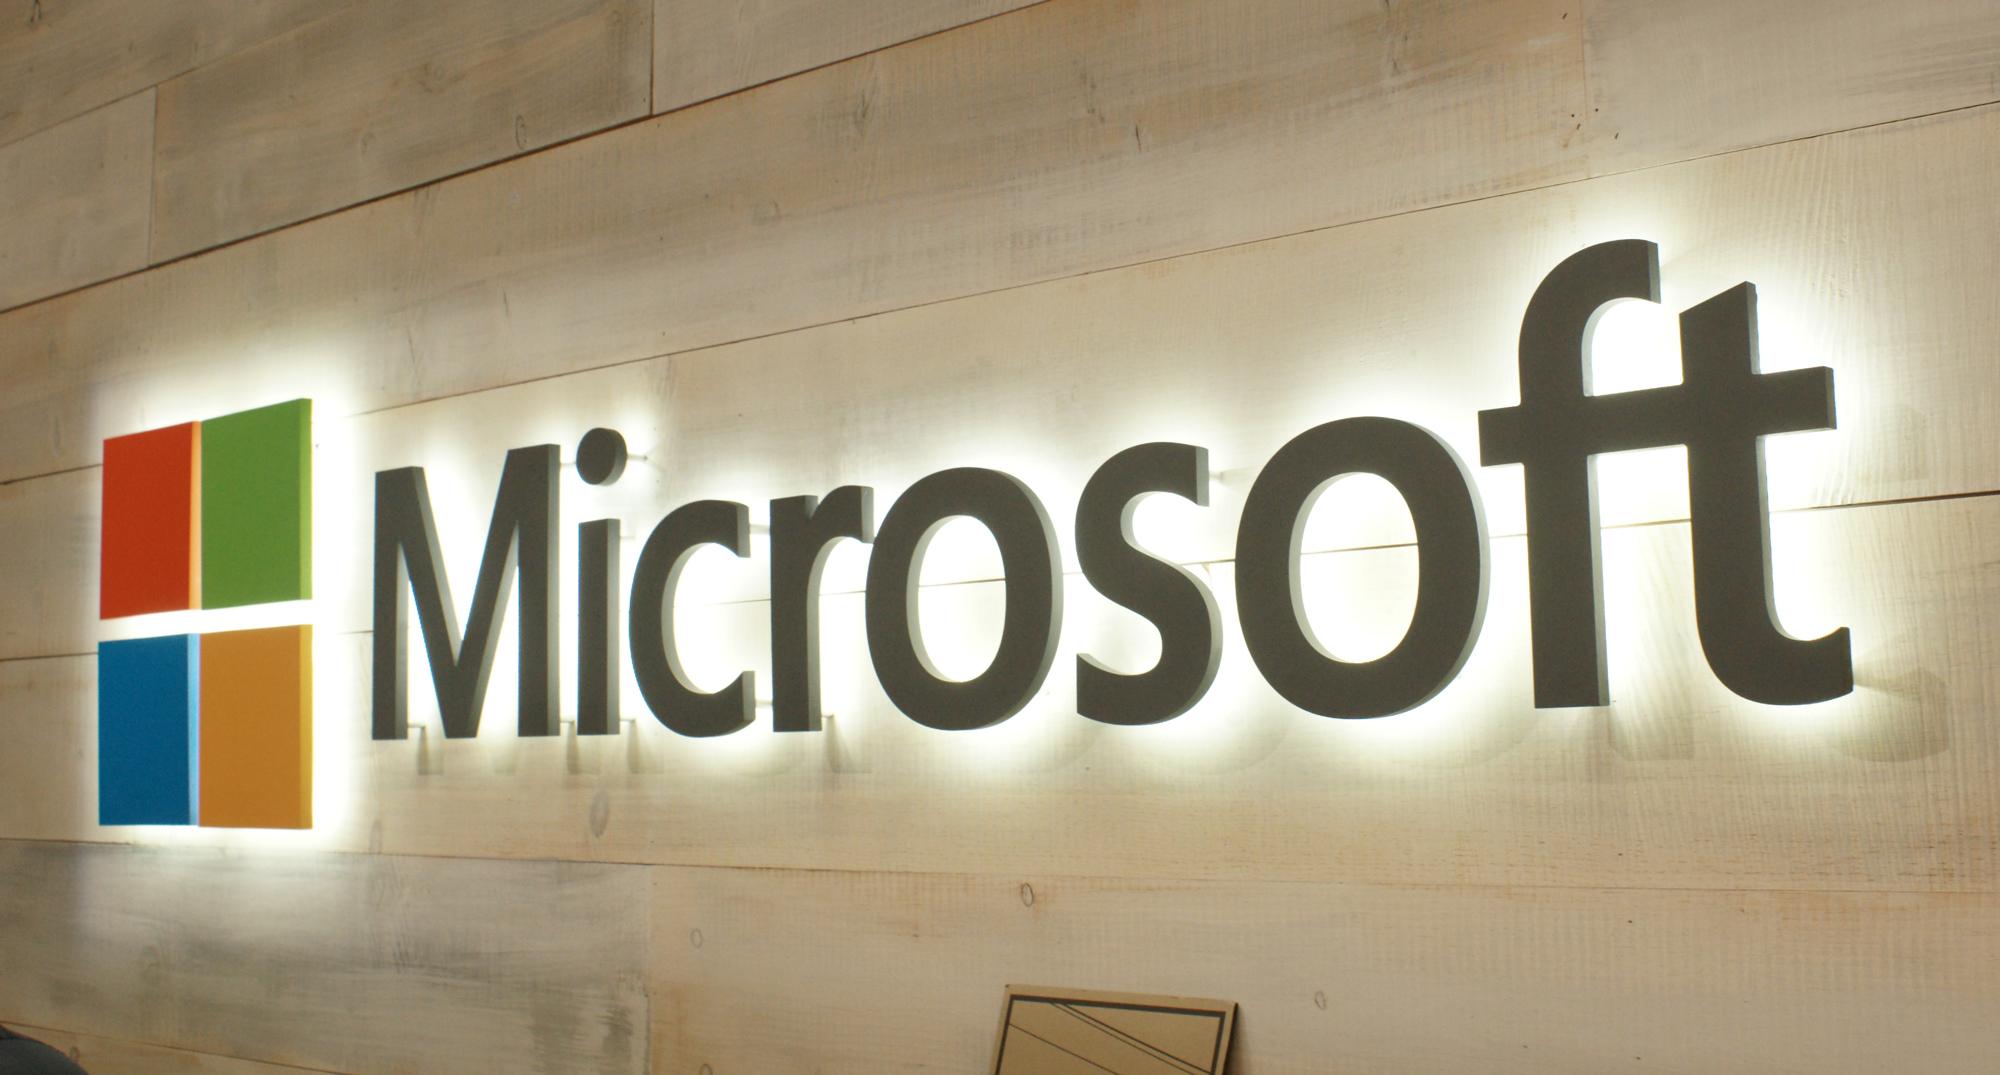 SUCCESS STORY : Jomiloju Tunde-Oladipo, 9 ans et ingénieur Microsoft